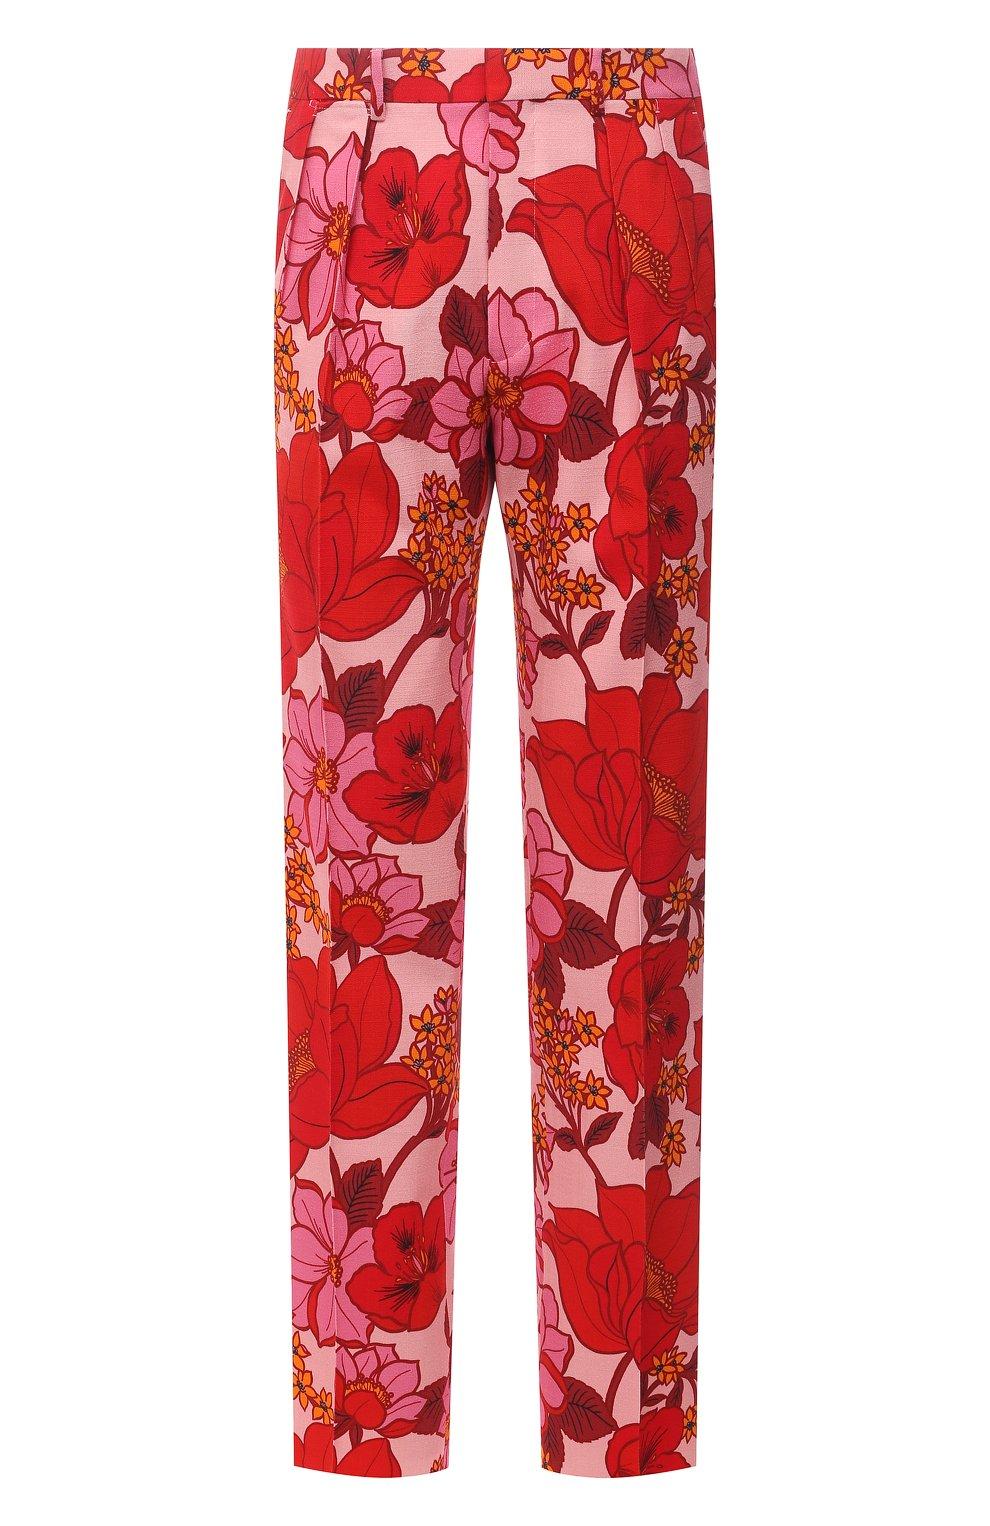 Мужские брюки из вискозы TOM FORD красного цвета, арт. 942R55/759F42 | Фото 1